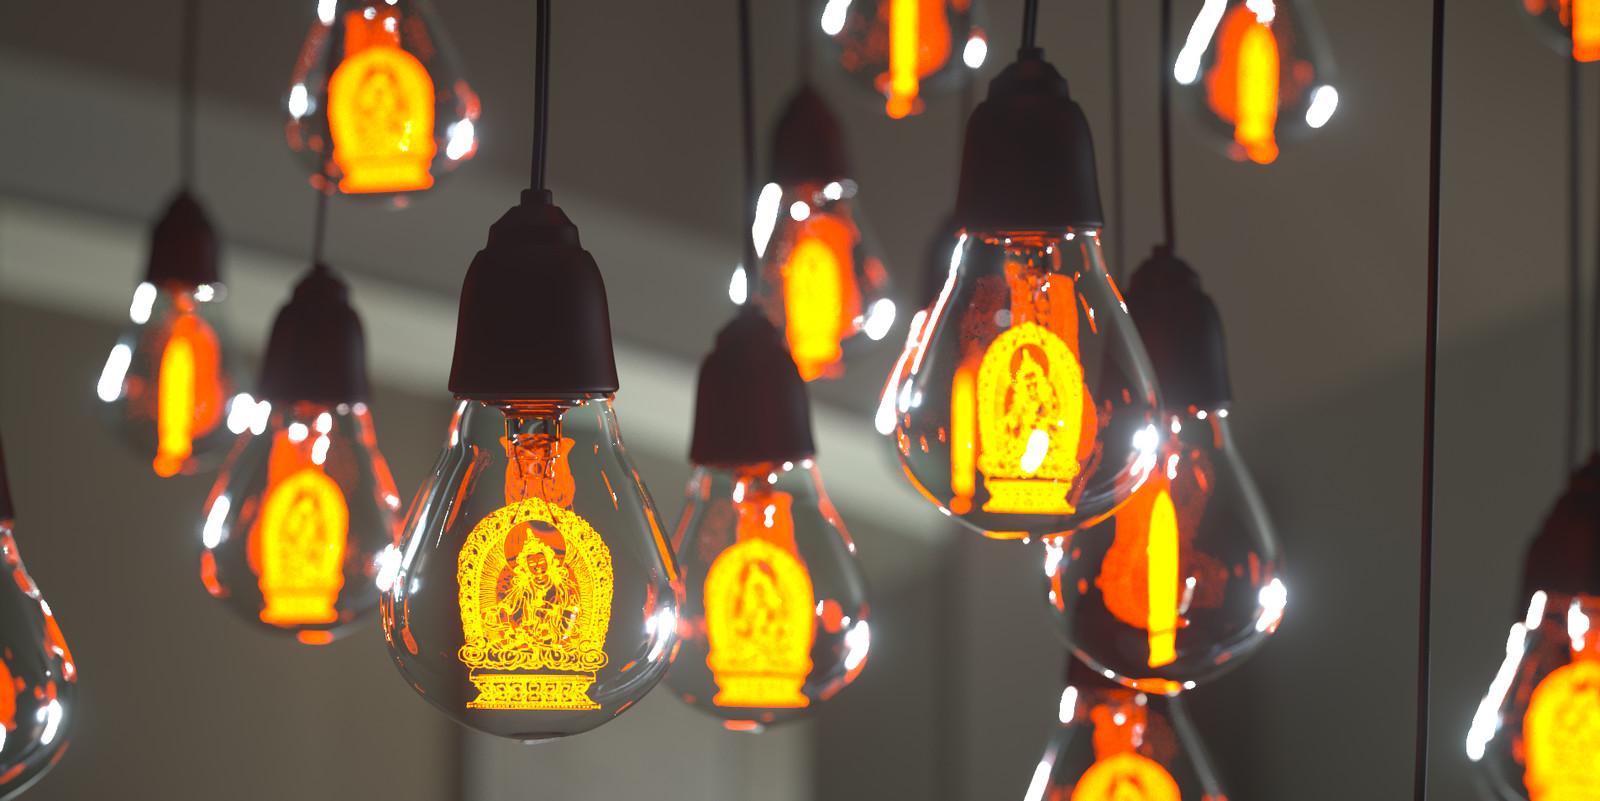 Enlightenbulbs